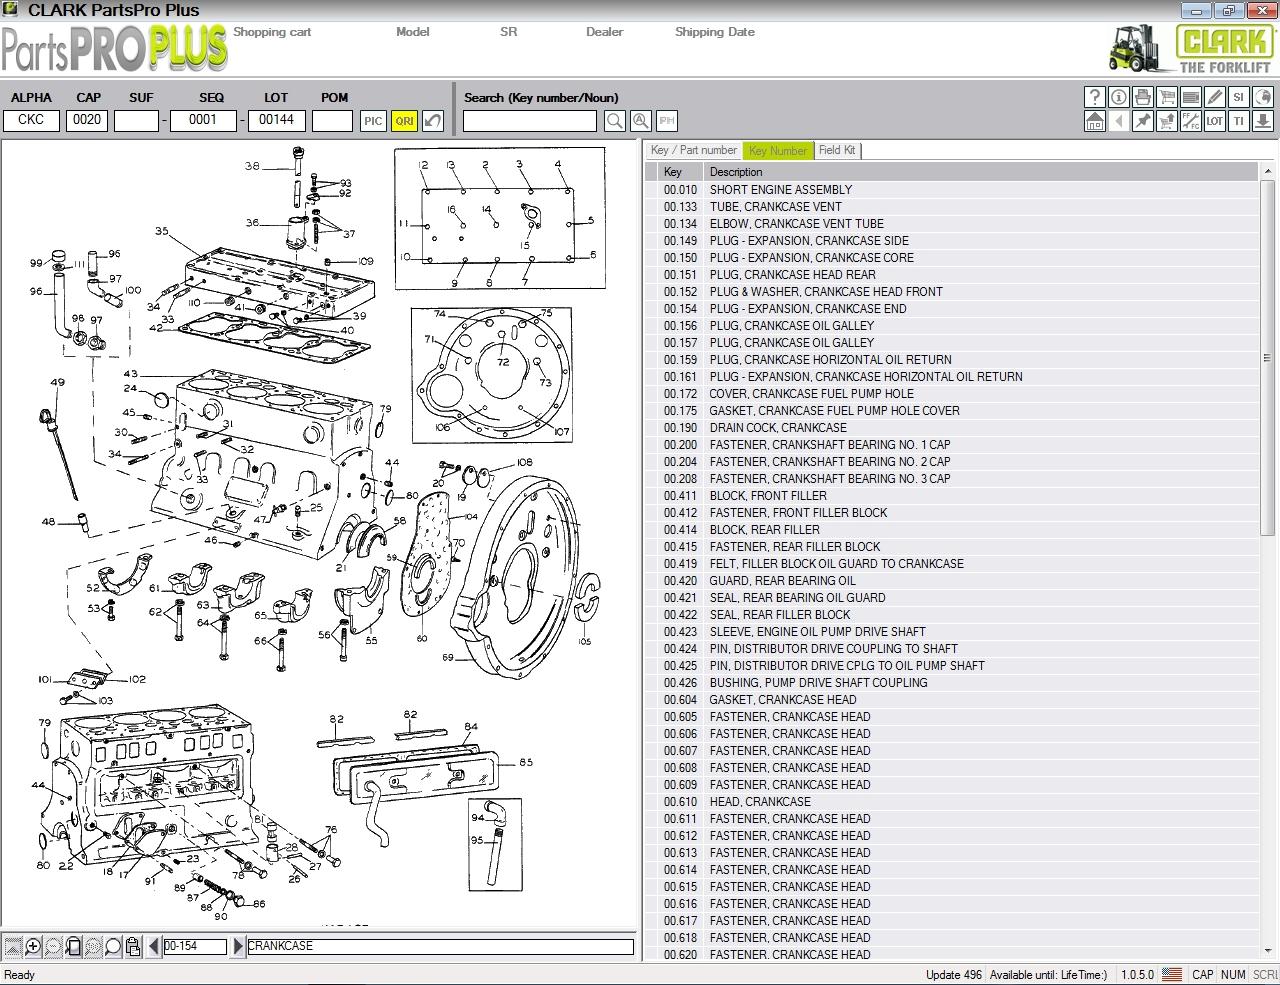 Clark Forklift Parts Pro Plus V496  01 2020